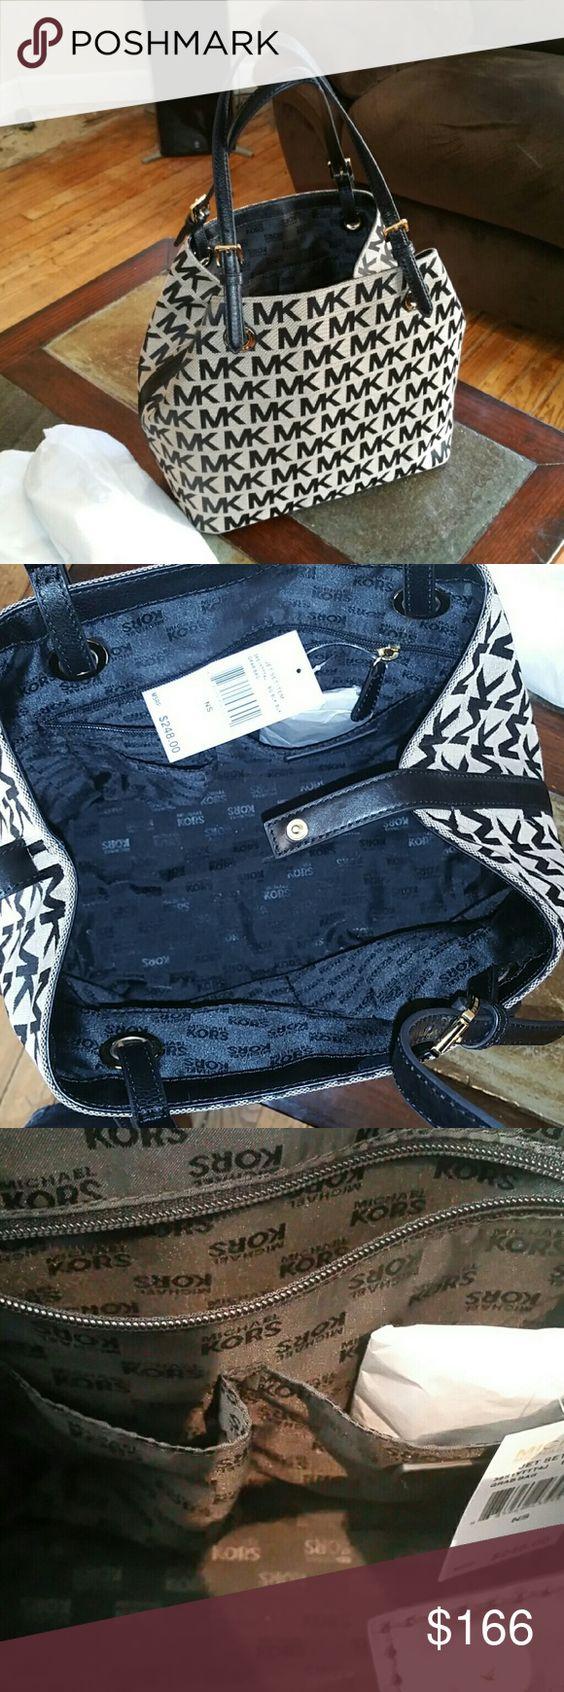 NEW MICHAEL KORS JET SET  TOTE Brand new michael kors bag with tag MICHAEL Michael Kors Bags Totes